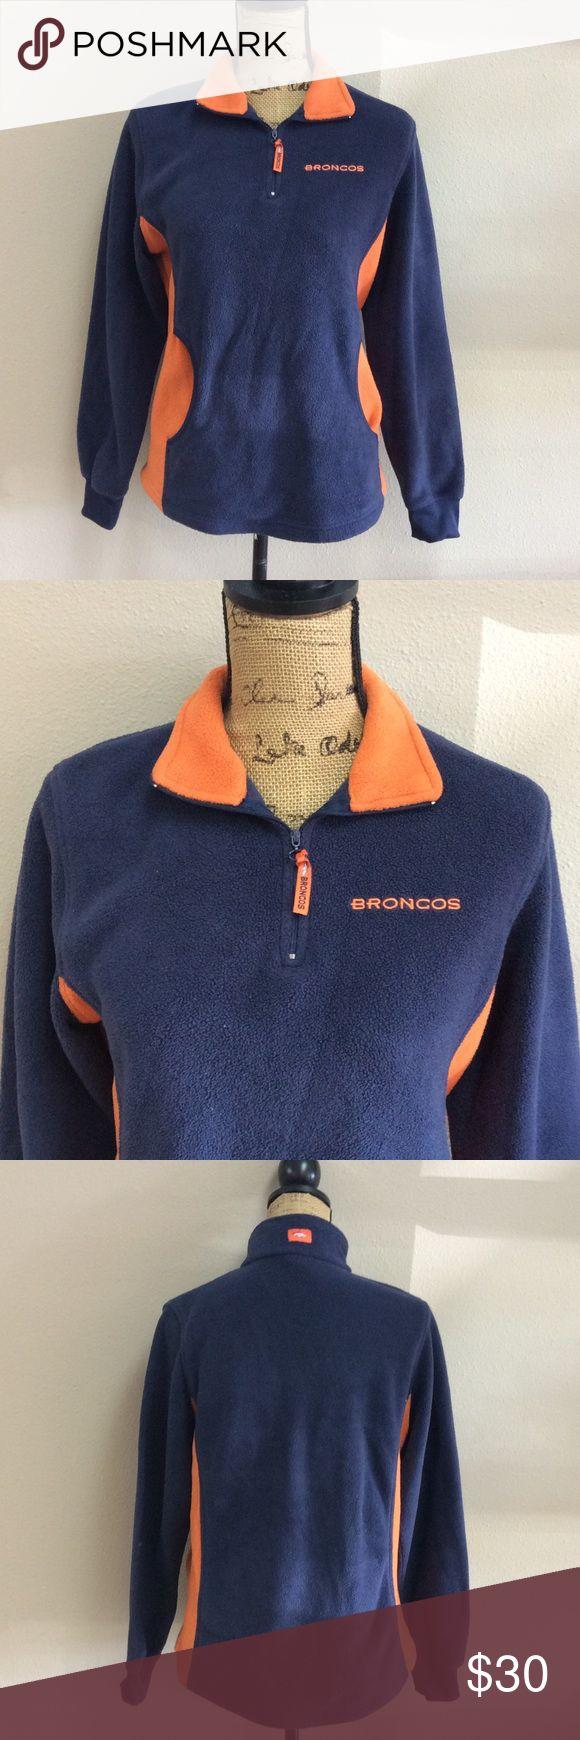 "NFL Bronco Fleece Dimensions: 28"", bust 36"" NFL Sweaters"